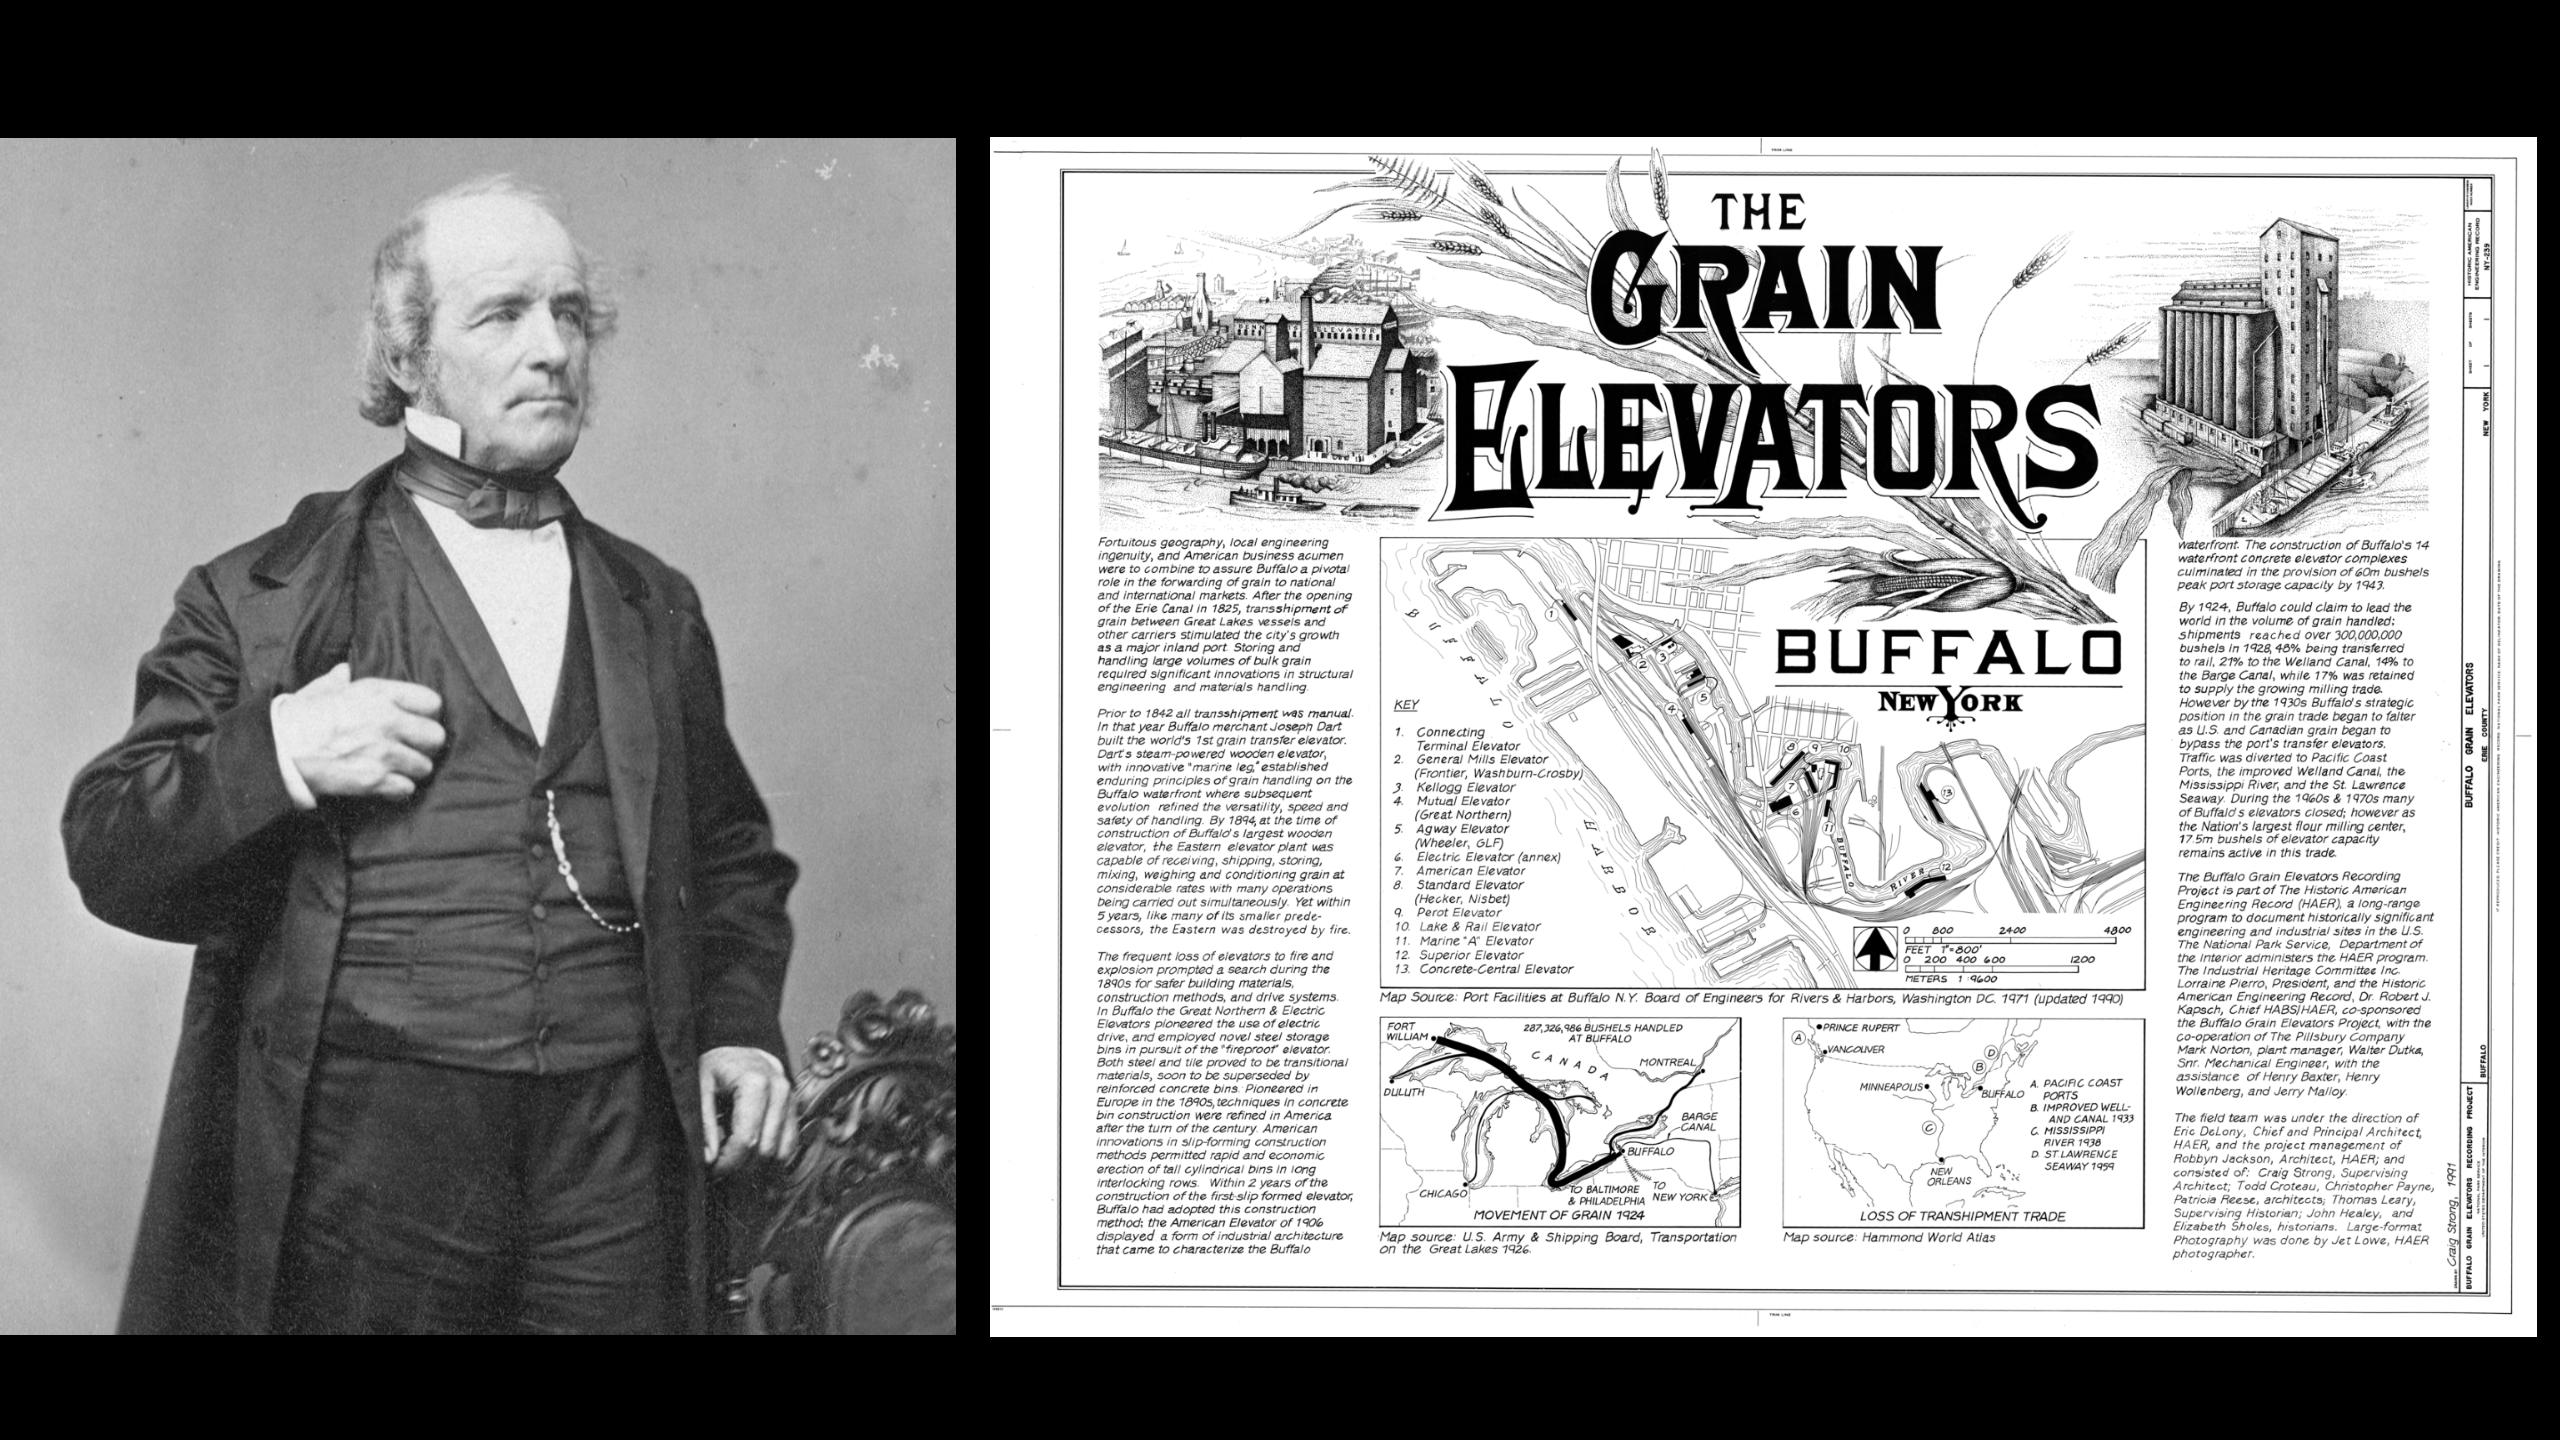 A portrait of Joseph Dart and an early map of Buffalo grain elevators